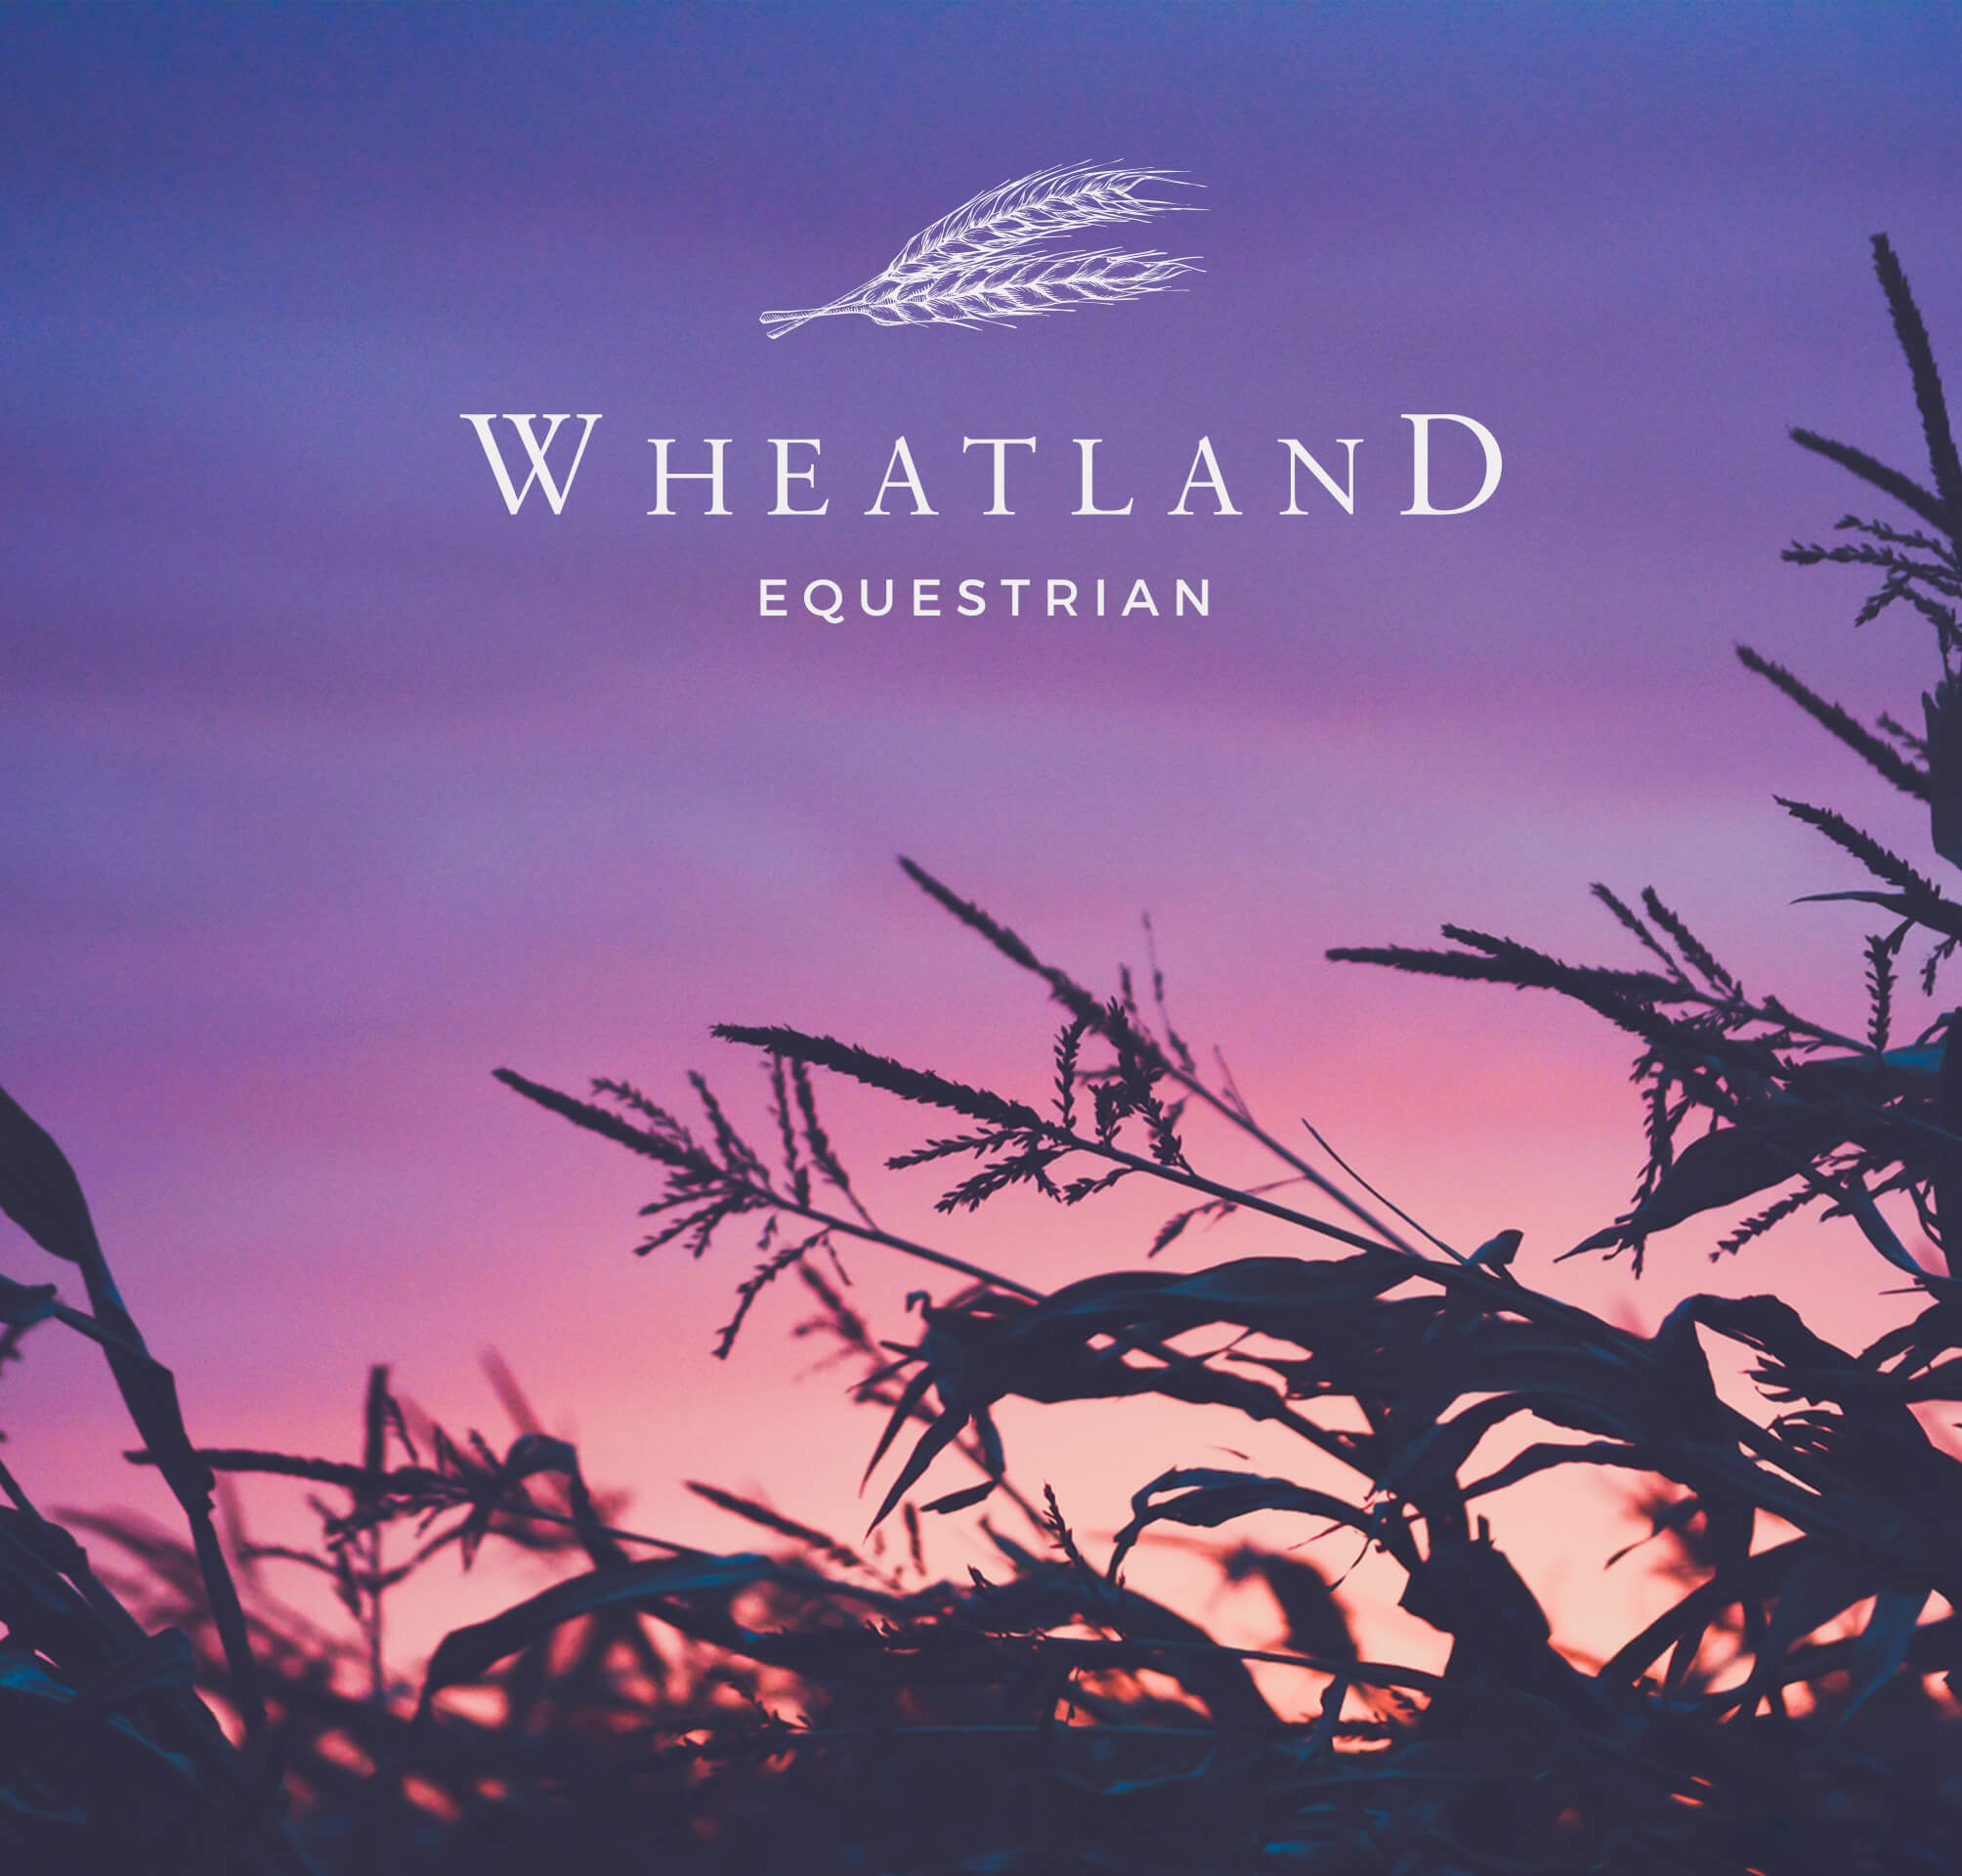 wheatland-equestrian-okotoks-webdesign.jpg